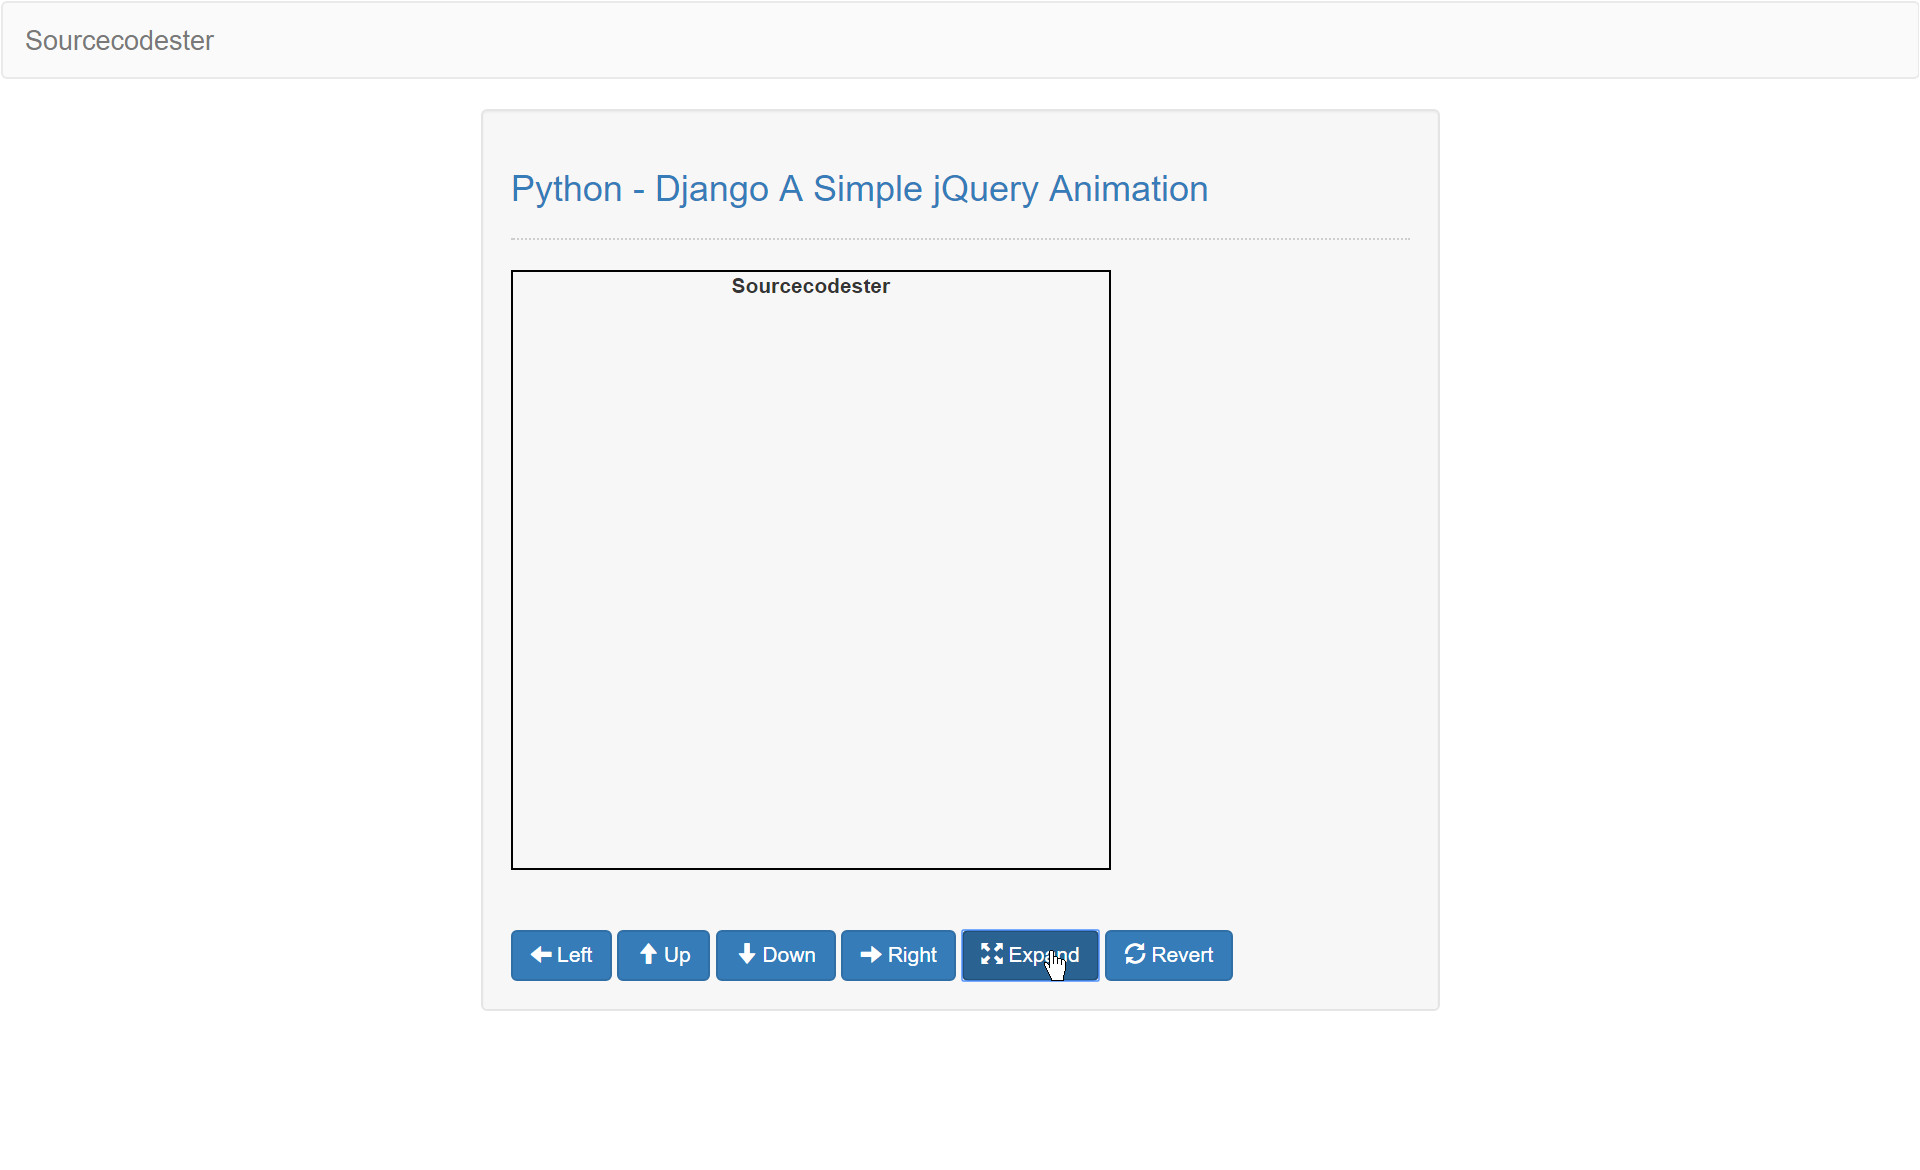 python django simple jquery animation